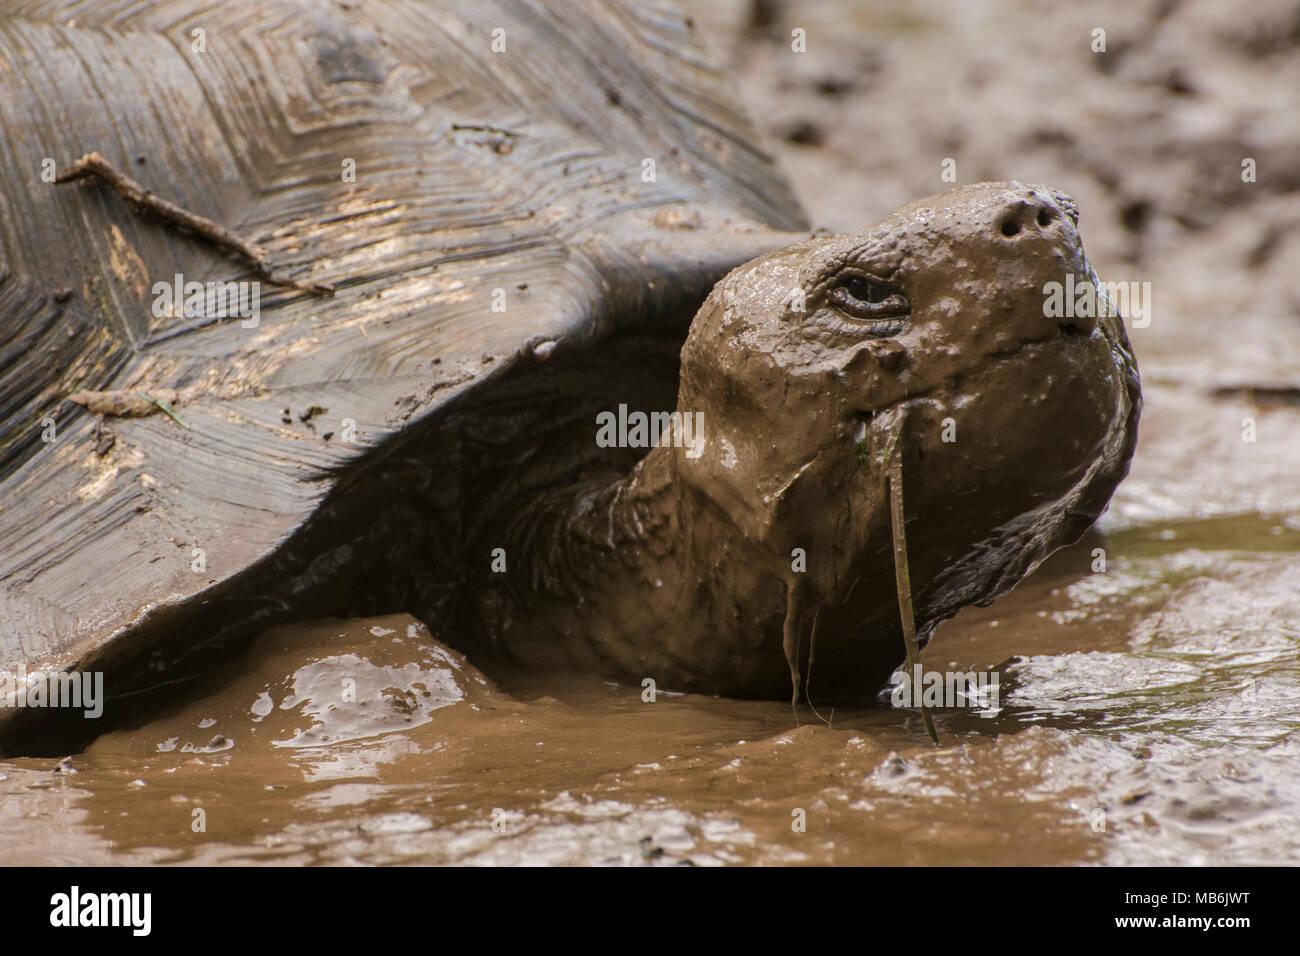 A Galapagos Giant Tortoise Chelonoidis Nigra Taking A Mud